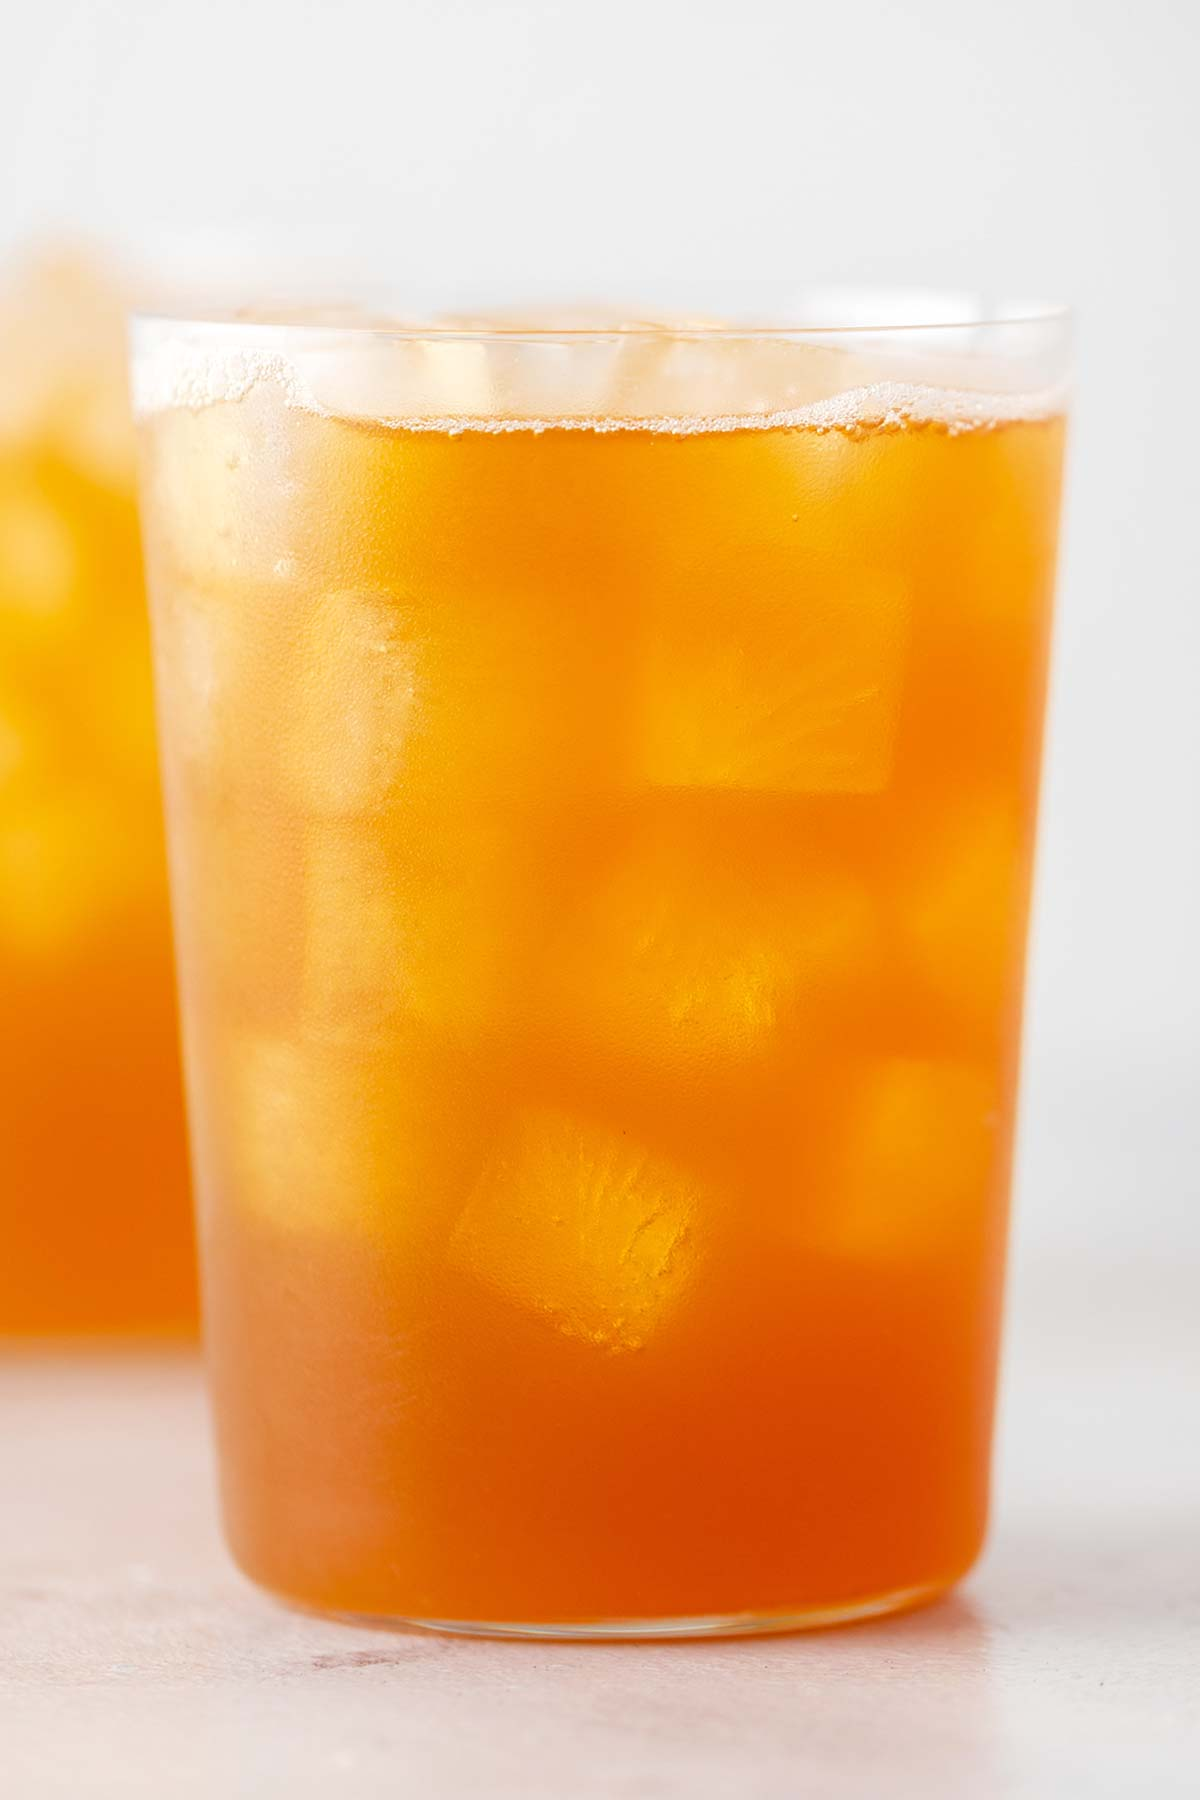 Iced black tea with lemonade recipe.